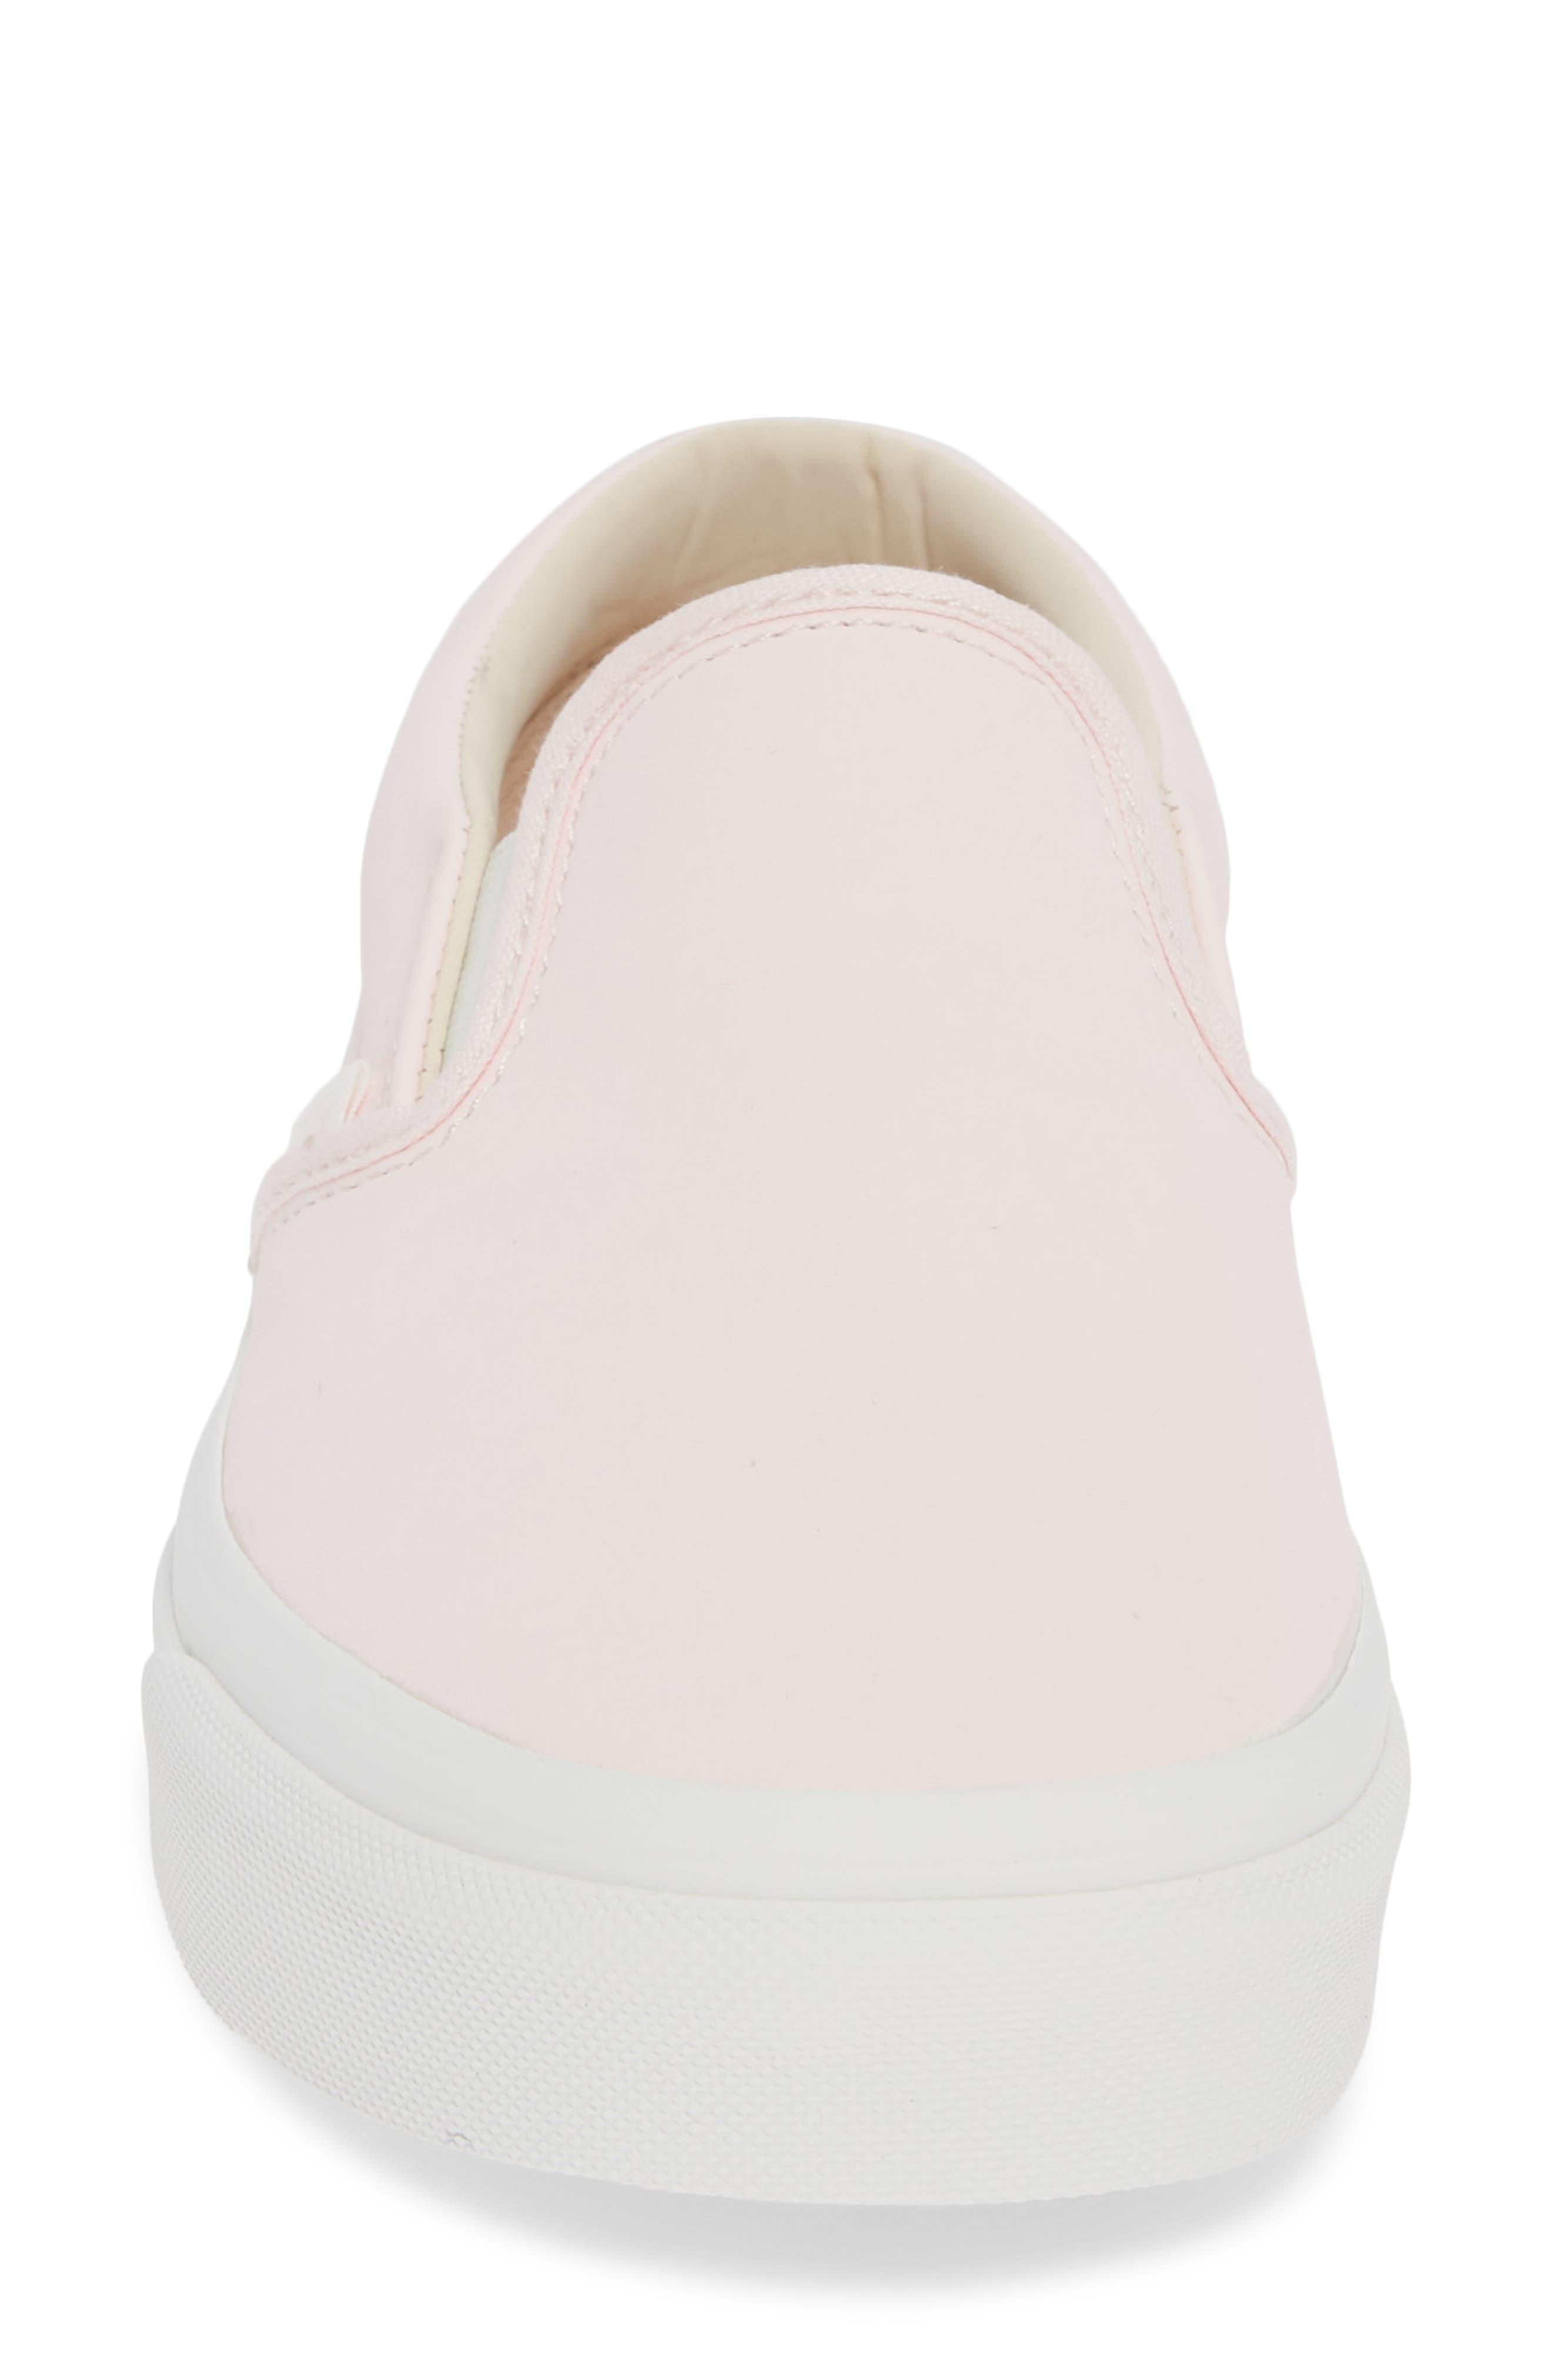 UA Classic Slip-On Sneaker,                             Alternate thumbnail 4, color,                             680